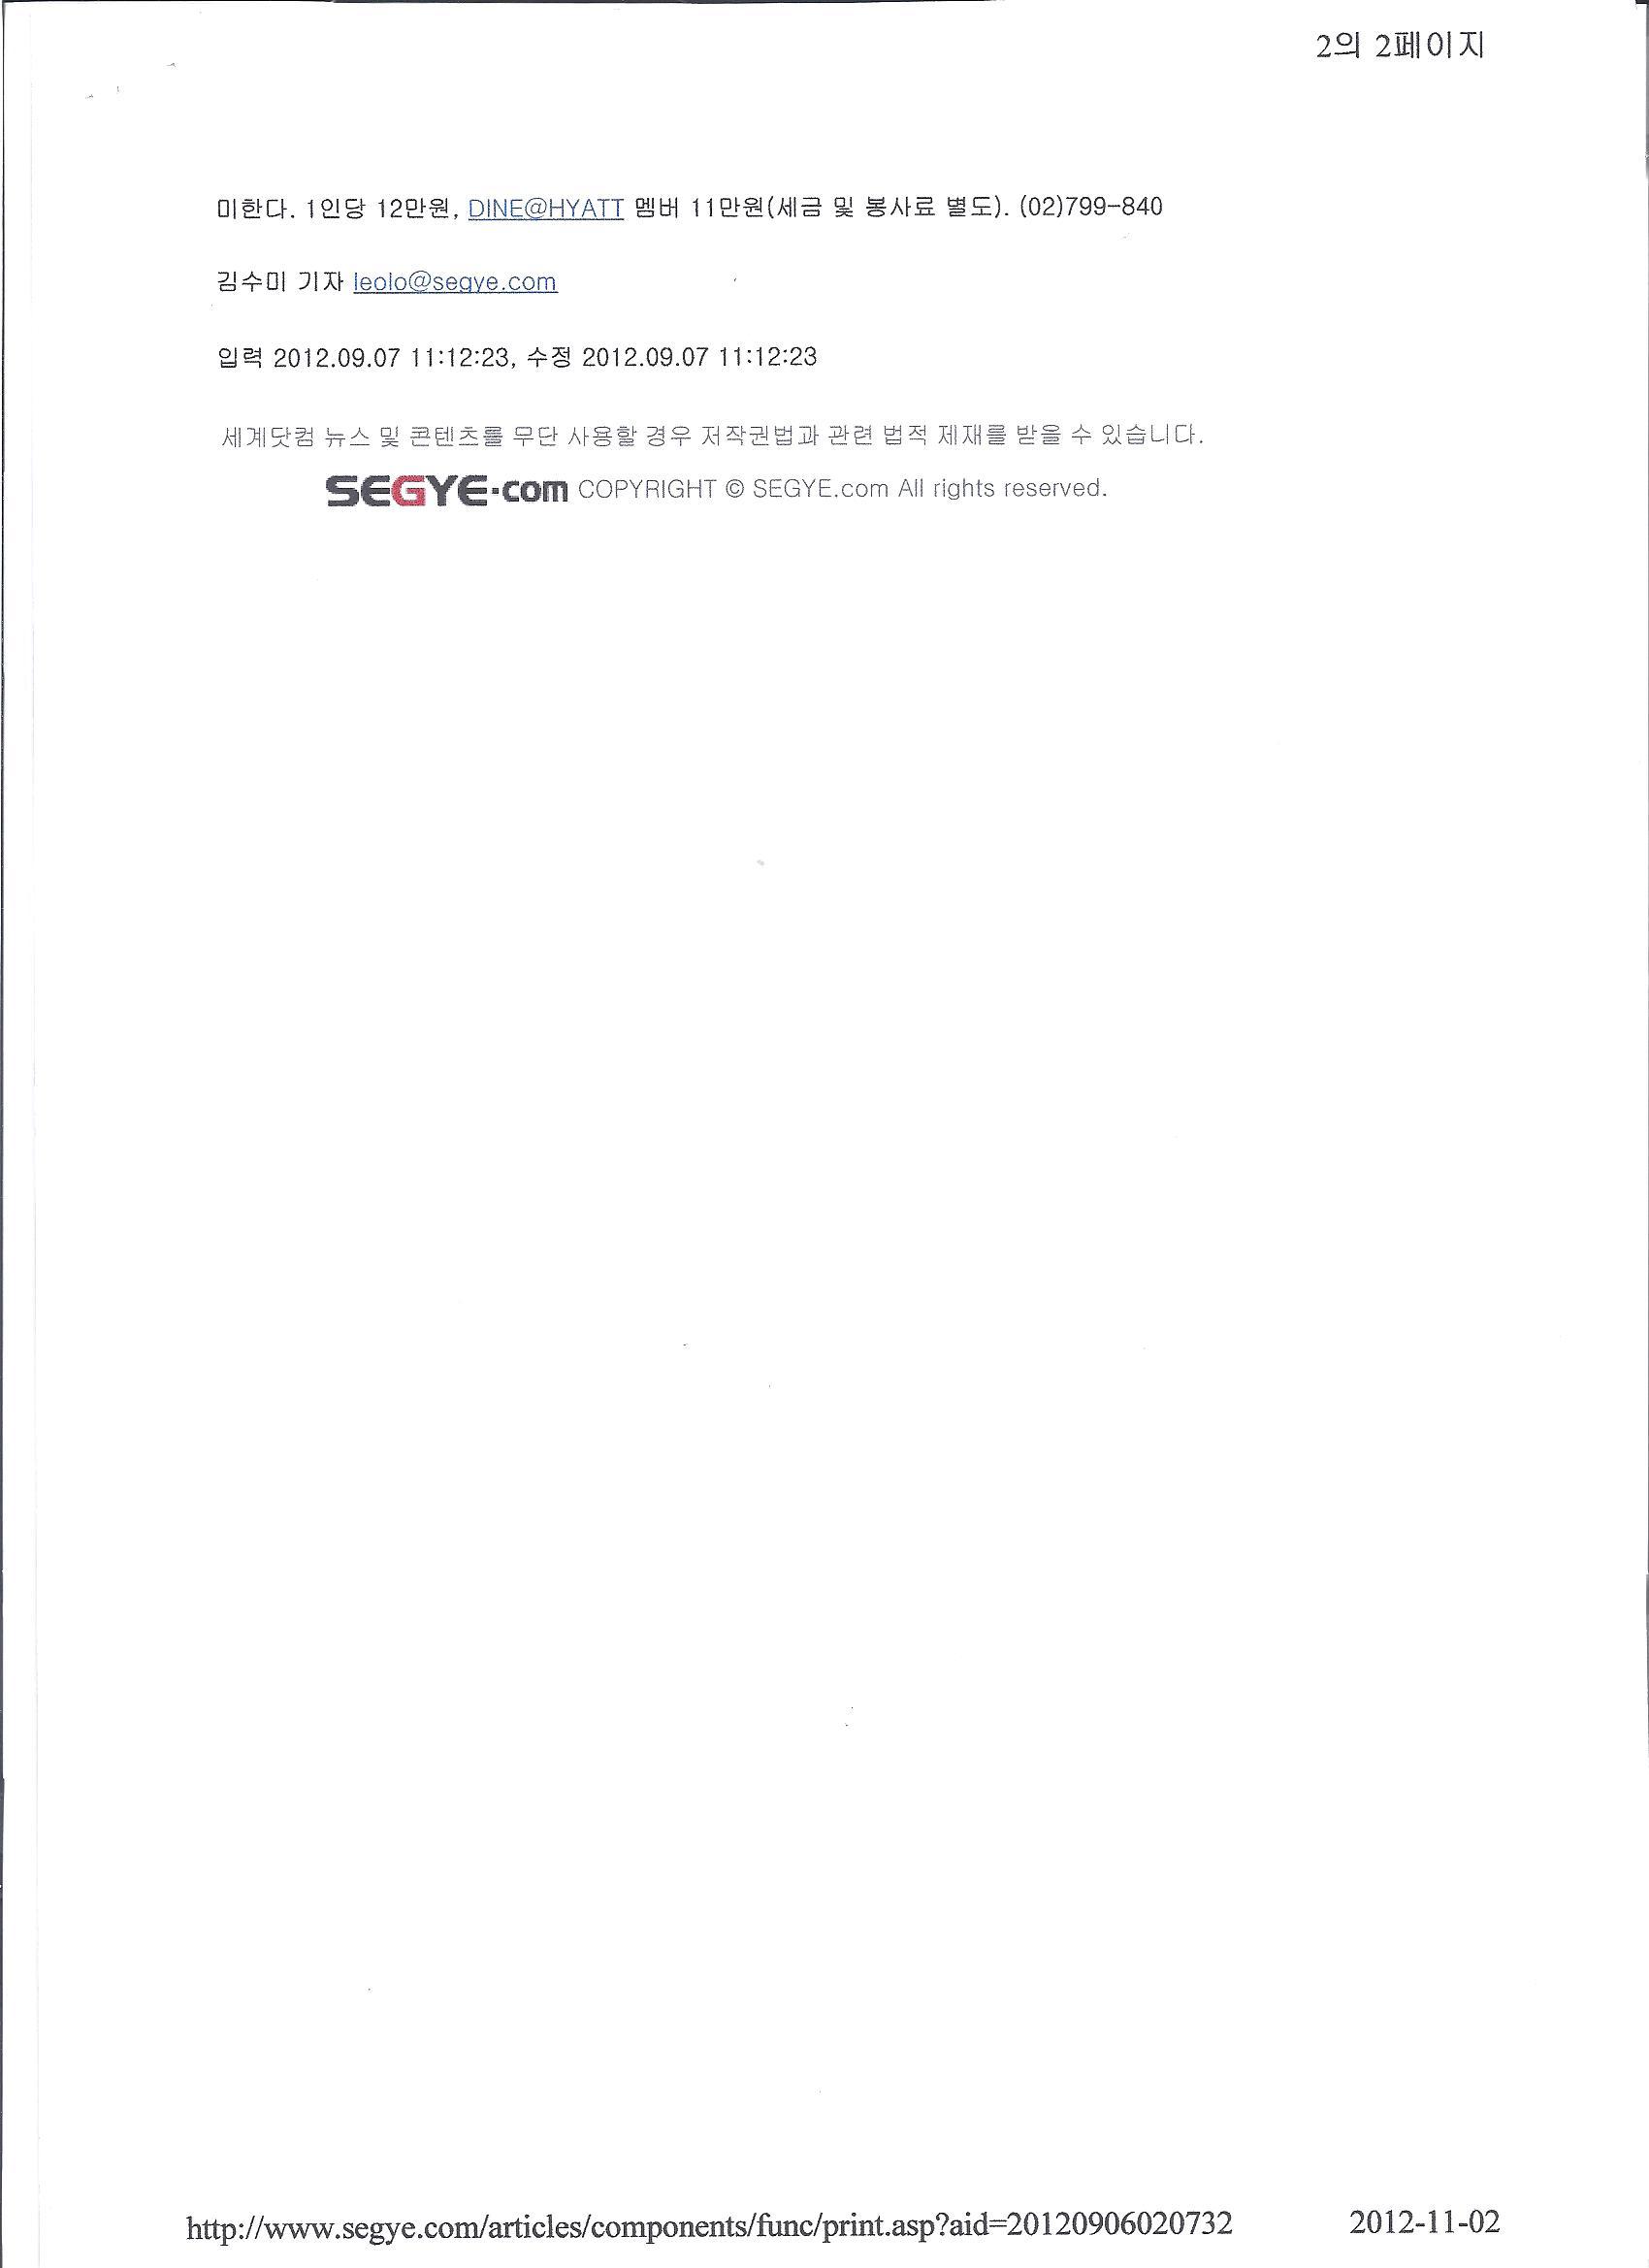 2012-9 Segye article 5.jpg